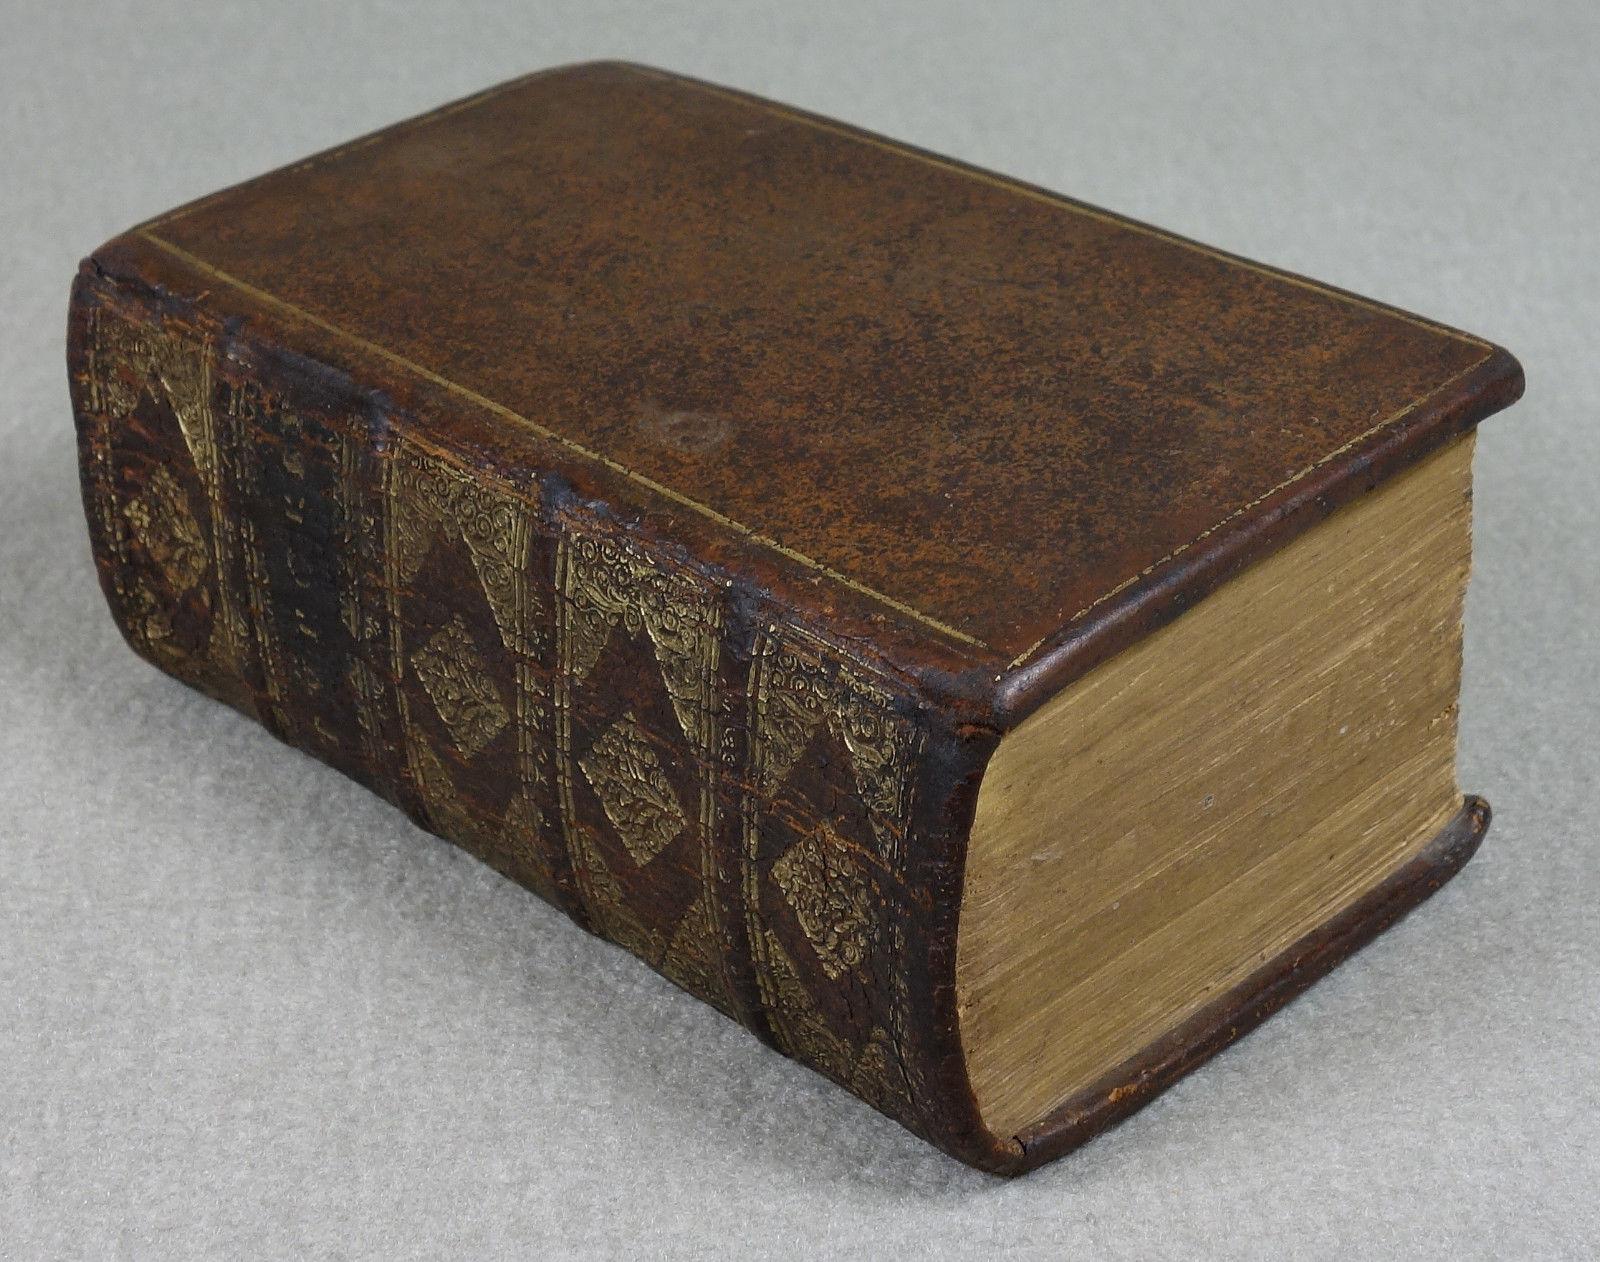 1678 - TÜRKEI - Osmanisches Reich - ORIENT Barock Ganzleder Adel Islam Leder RAR